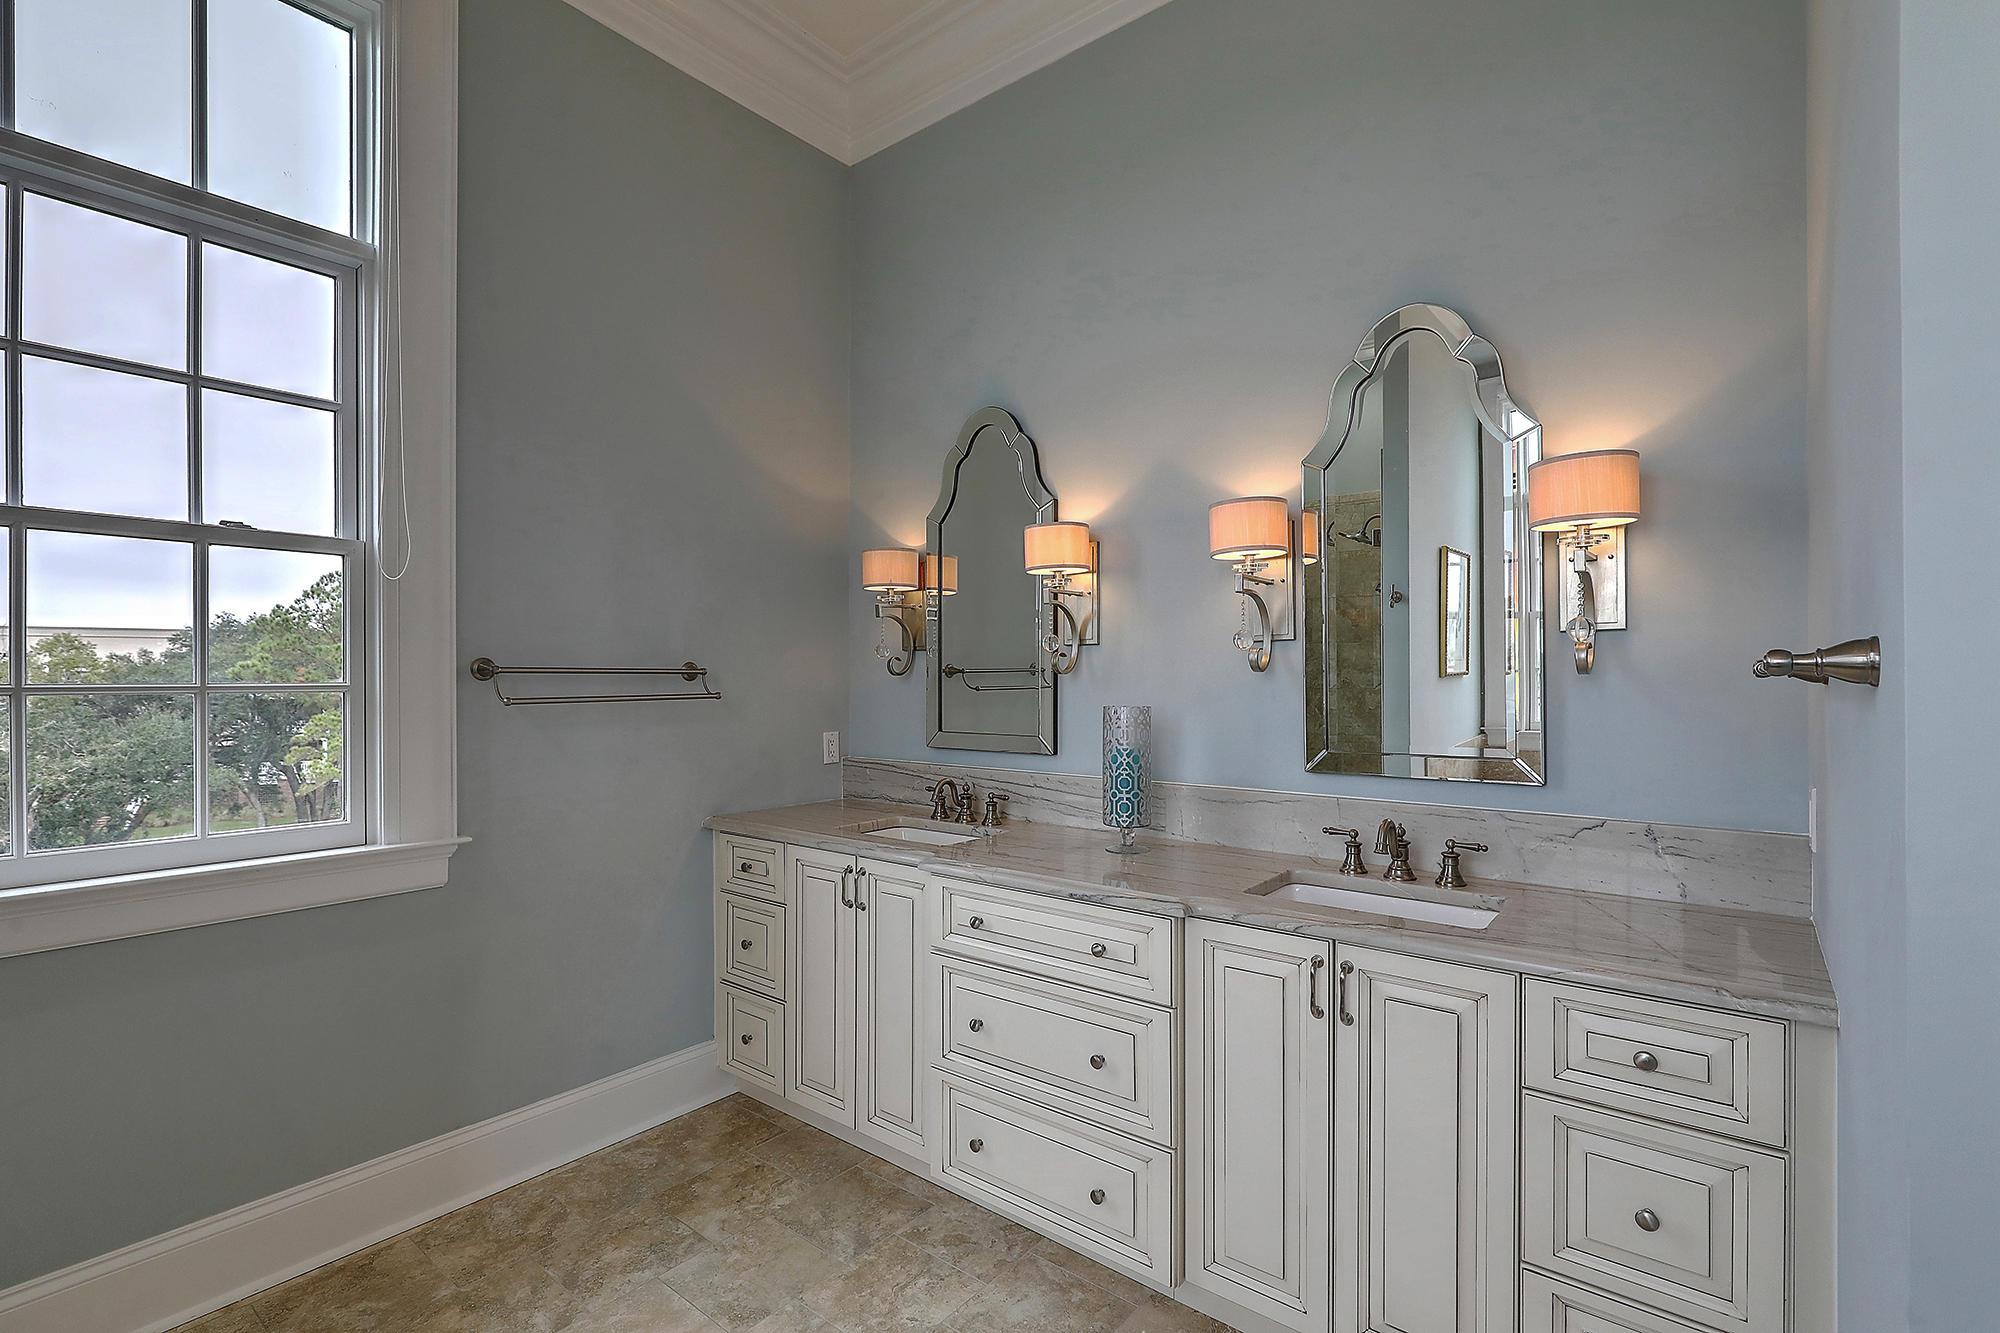 Daniel Island Park Homes For Sale - 134 Fairbanks Oak Allee, Charleston, SC - 0